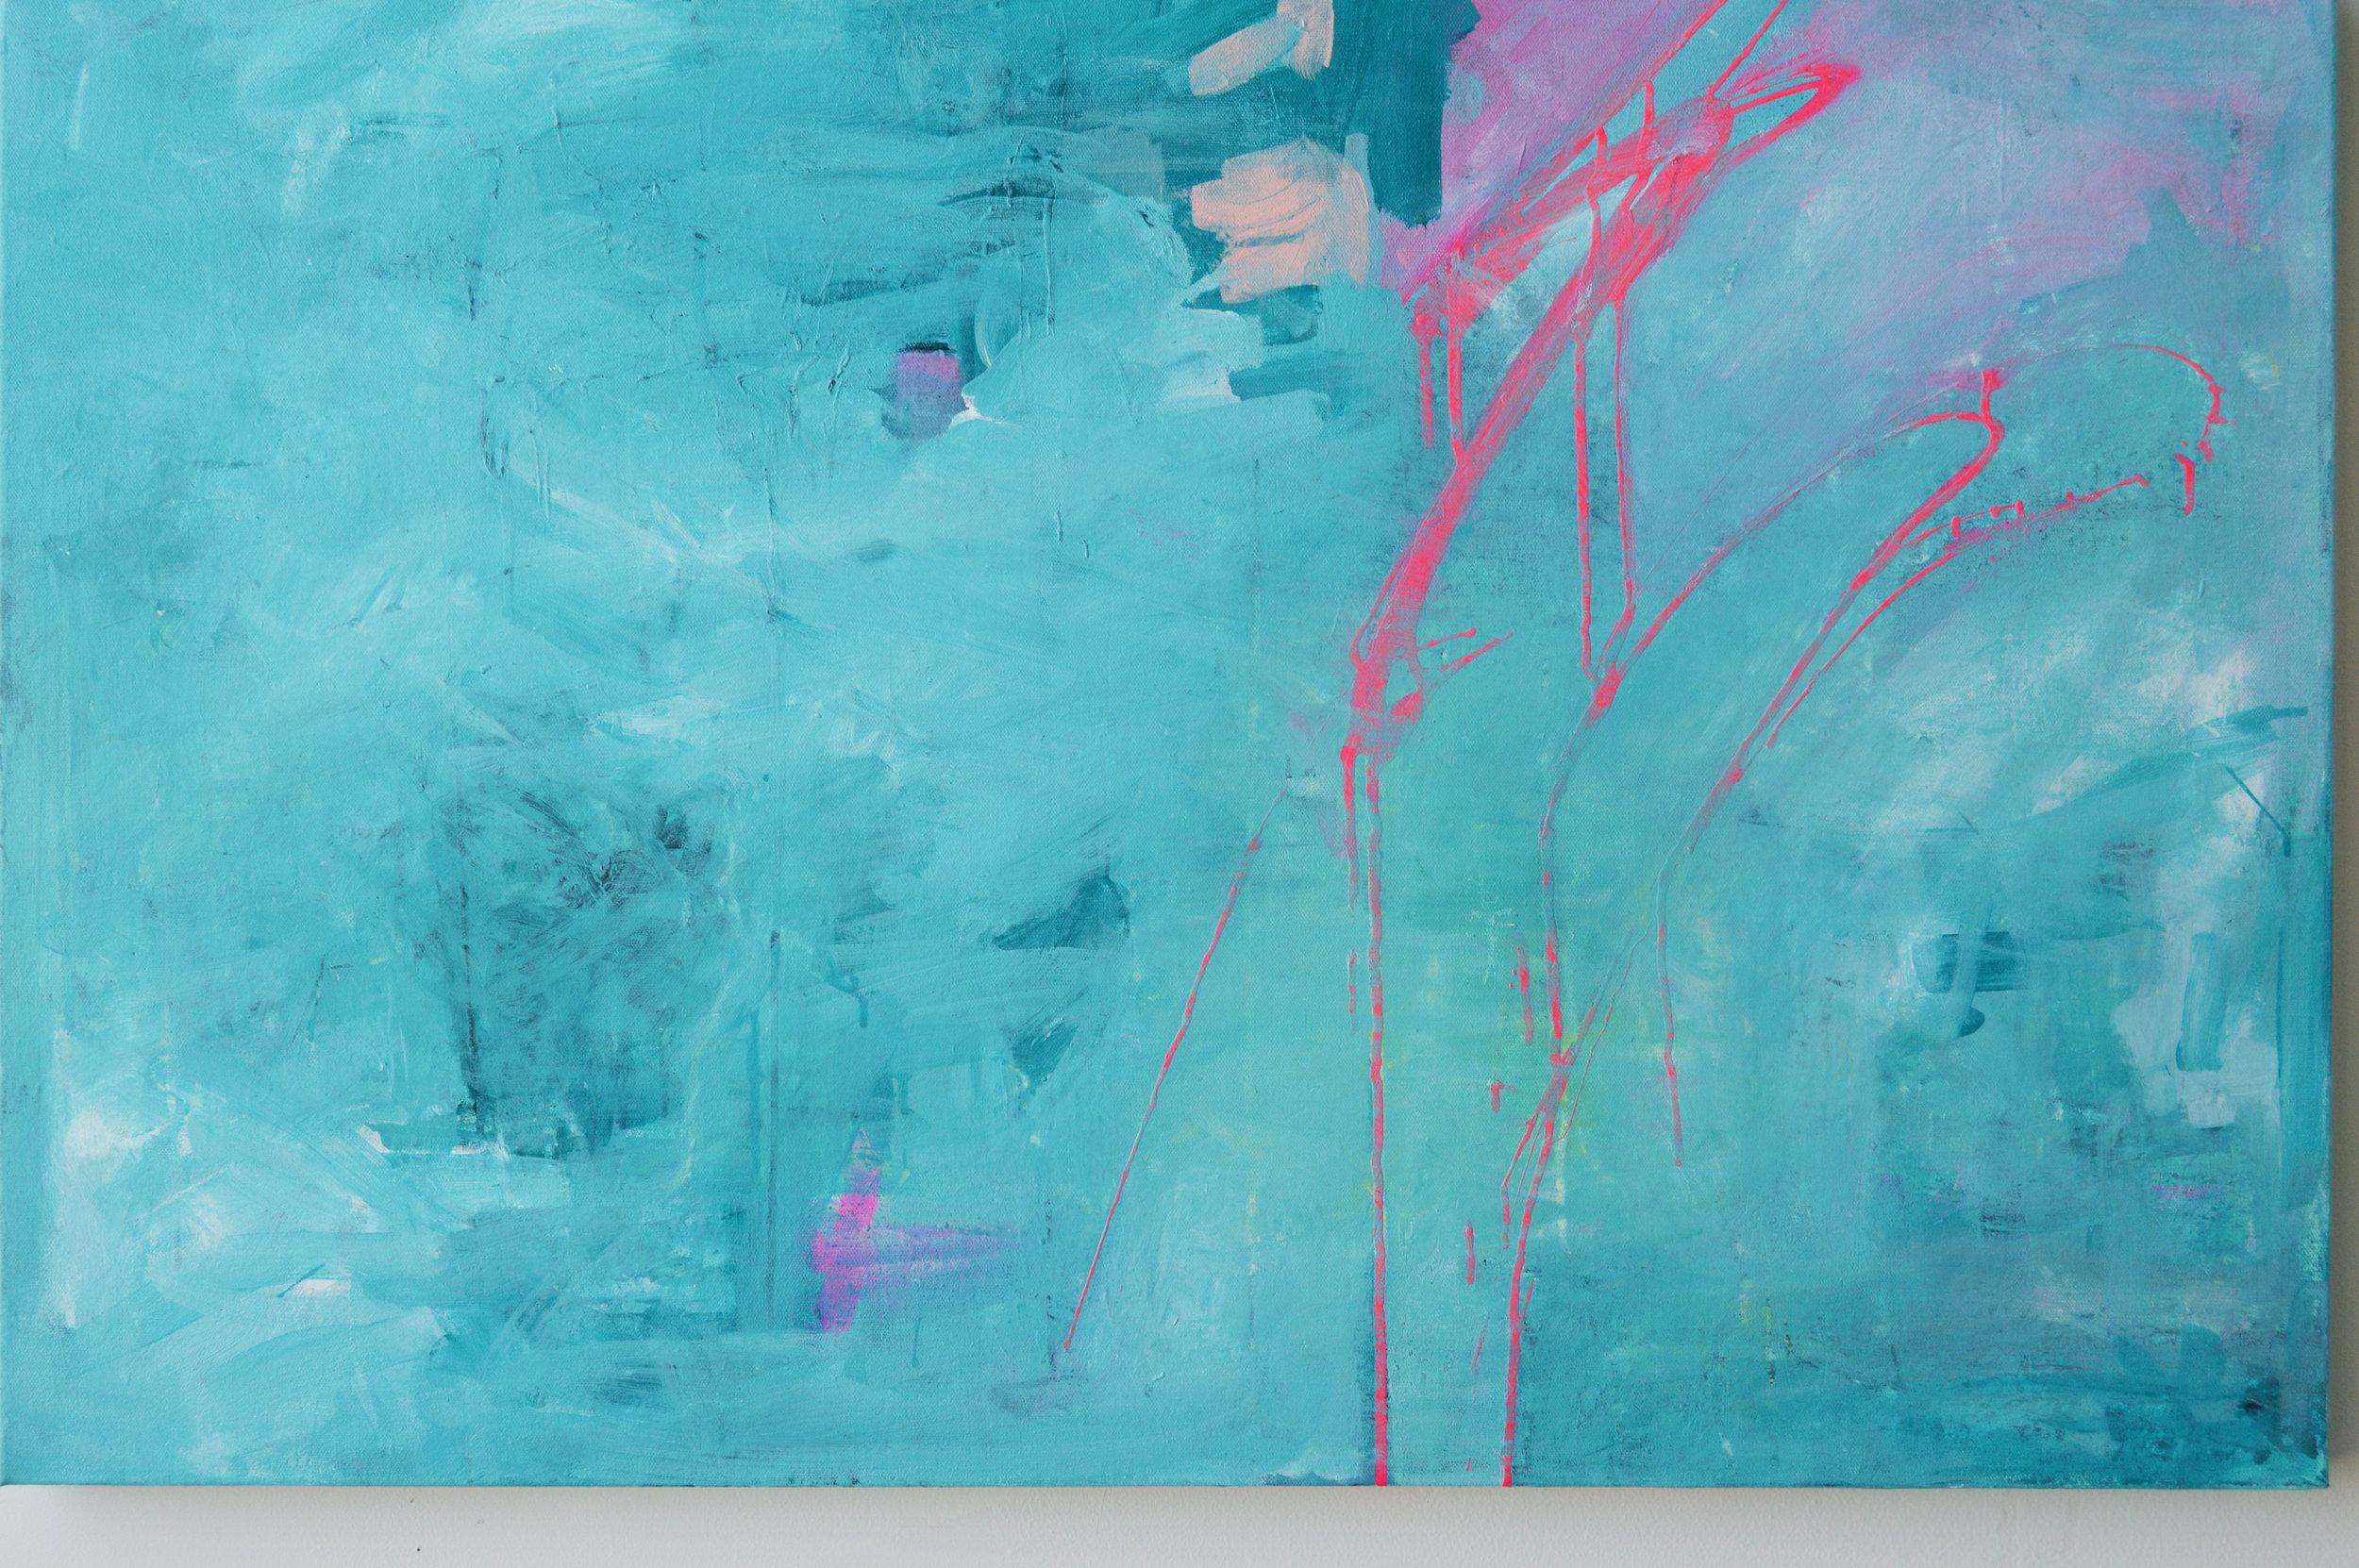 Baliblue abstract.closeup.jenmeyer.2015.24x36x1.5.jpg